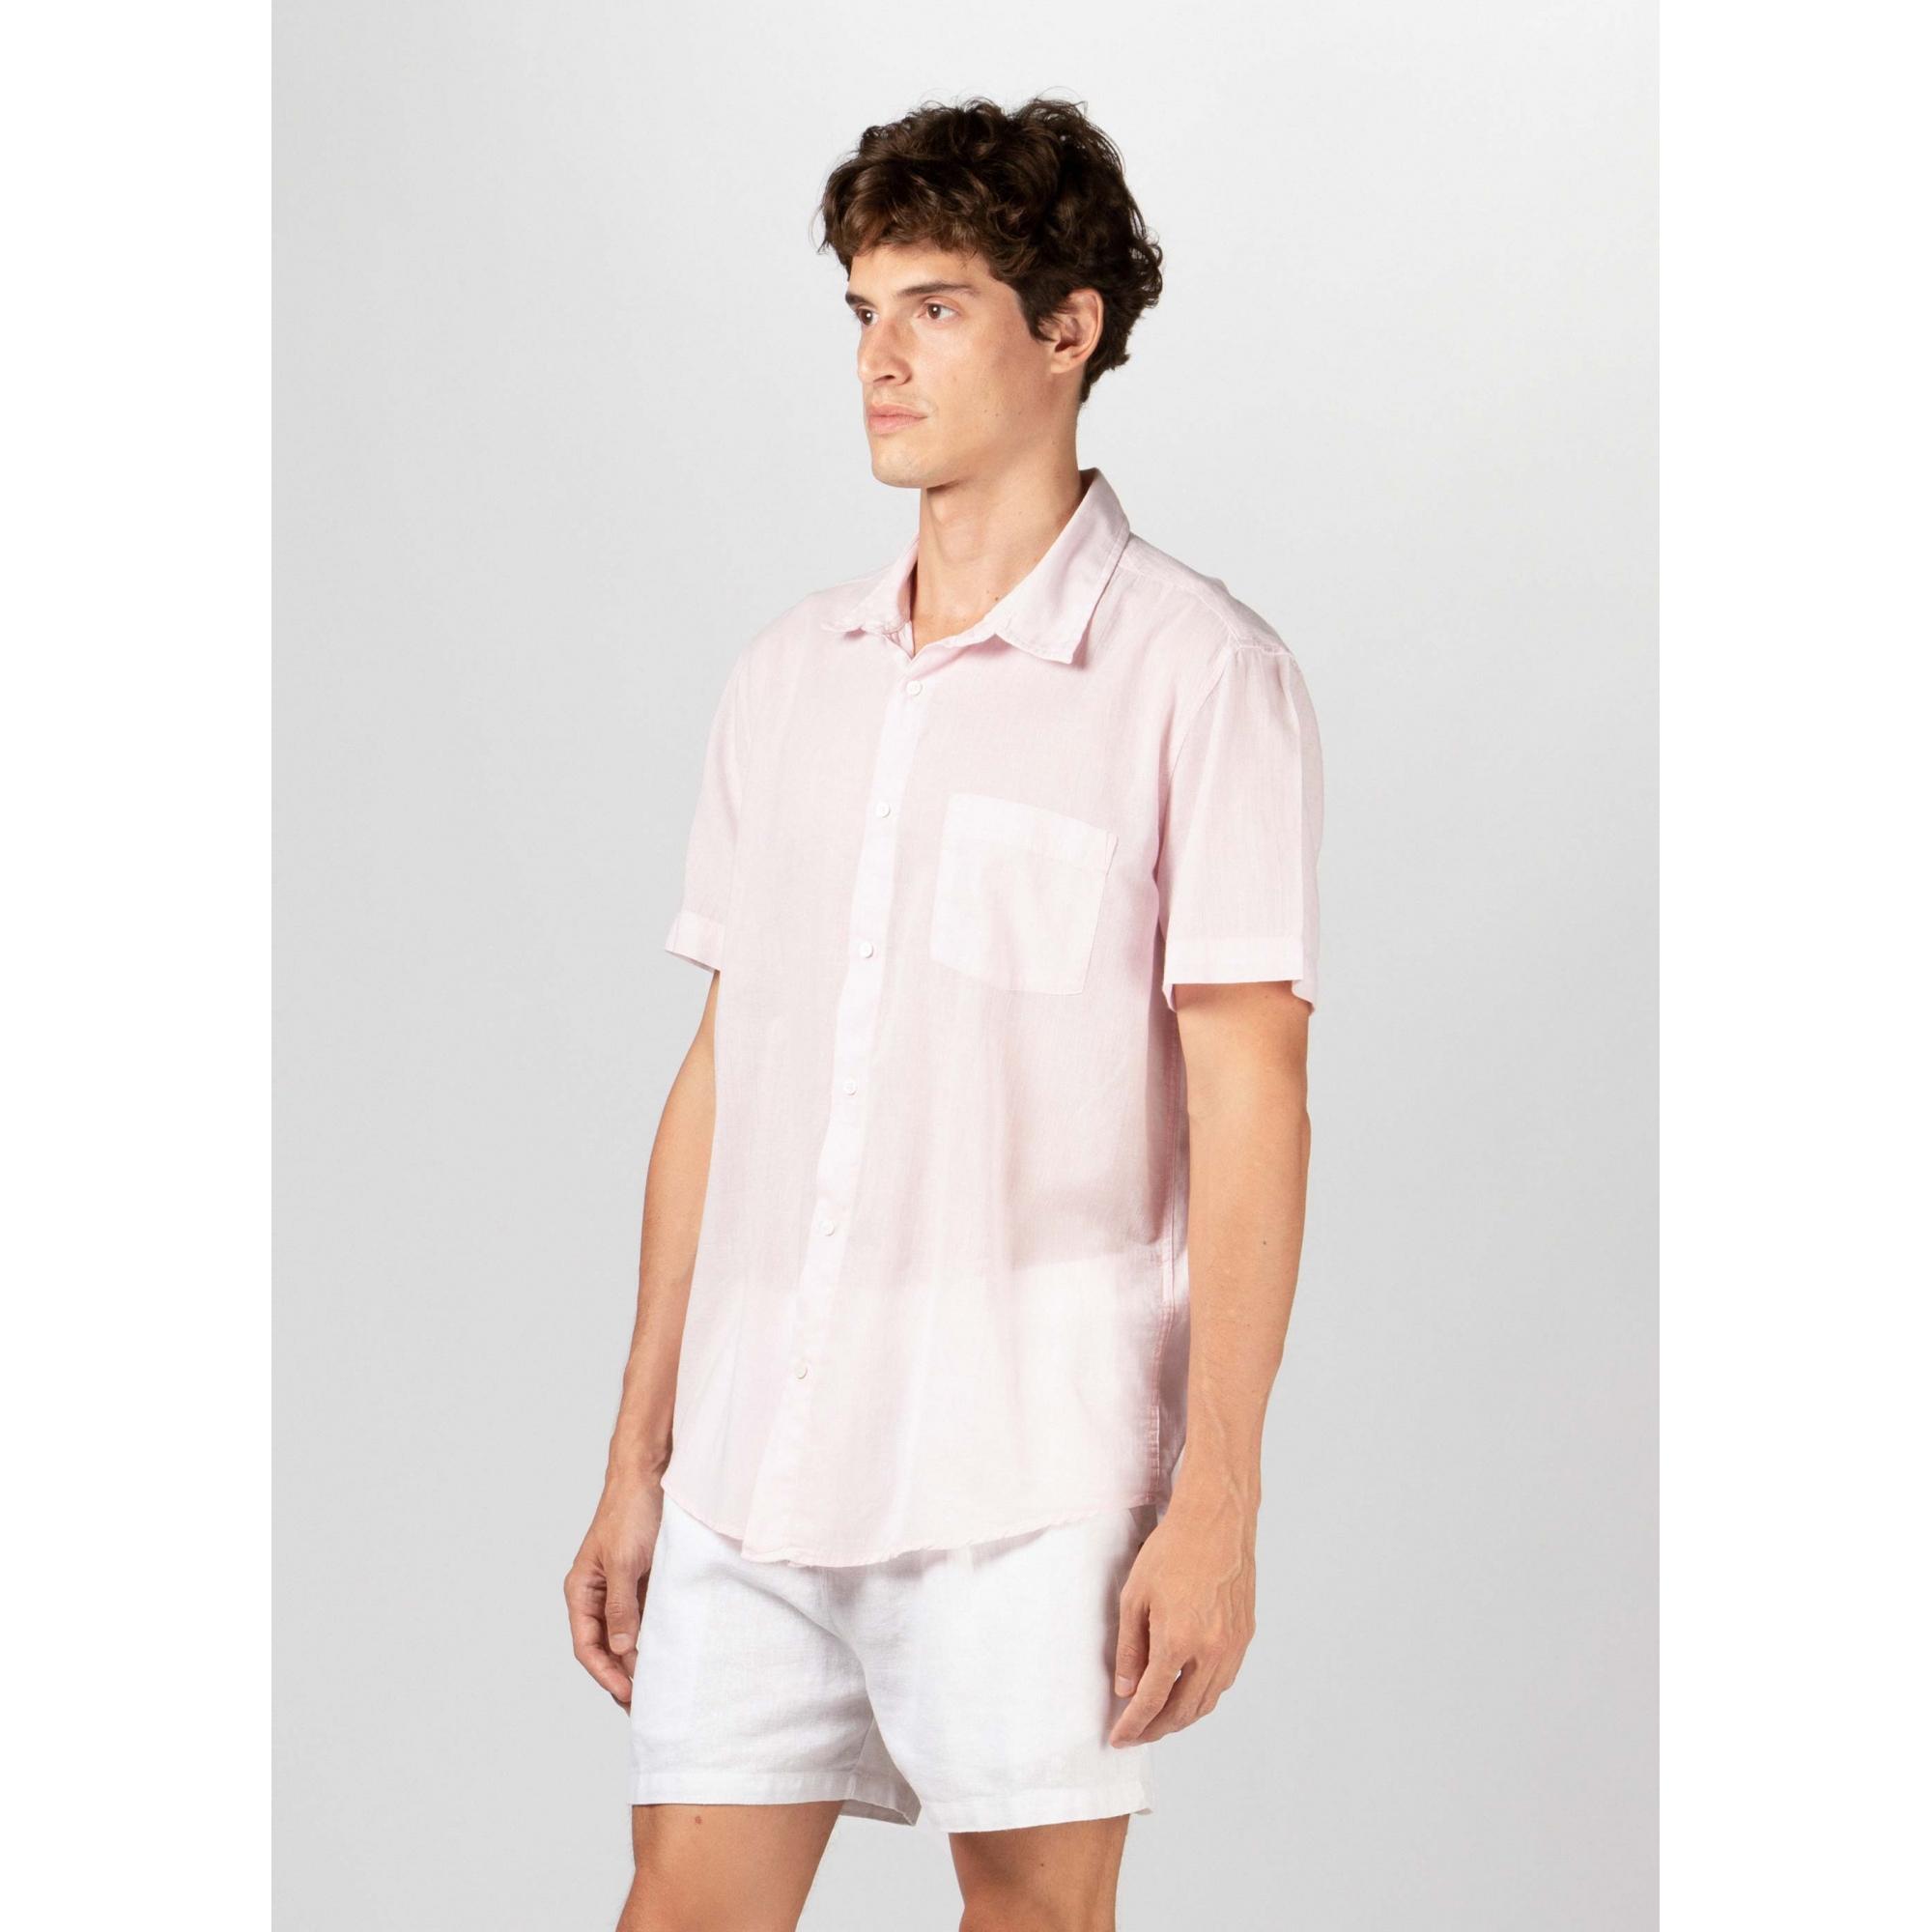 Osklen Camisa Organic e-Colors Manga Curta Masculino Rosa Claro